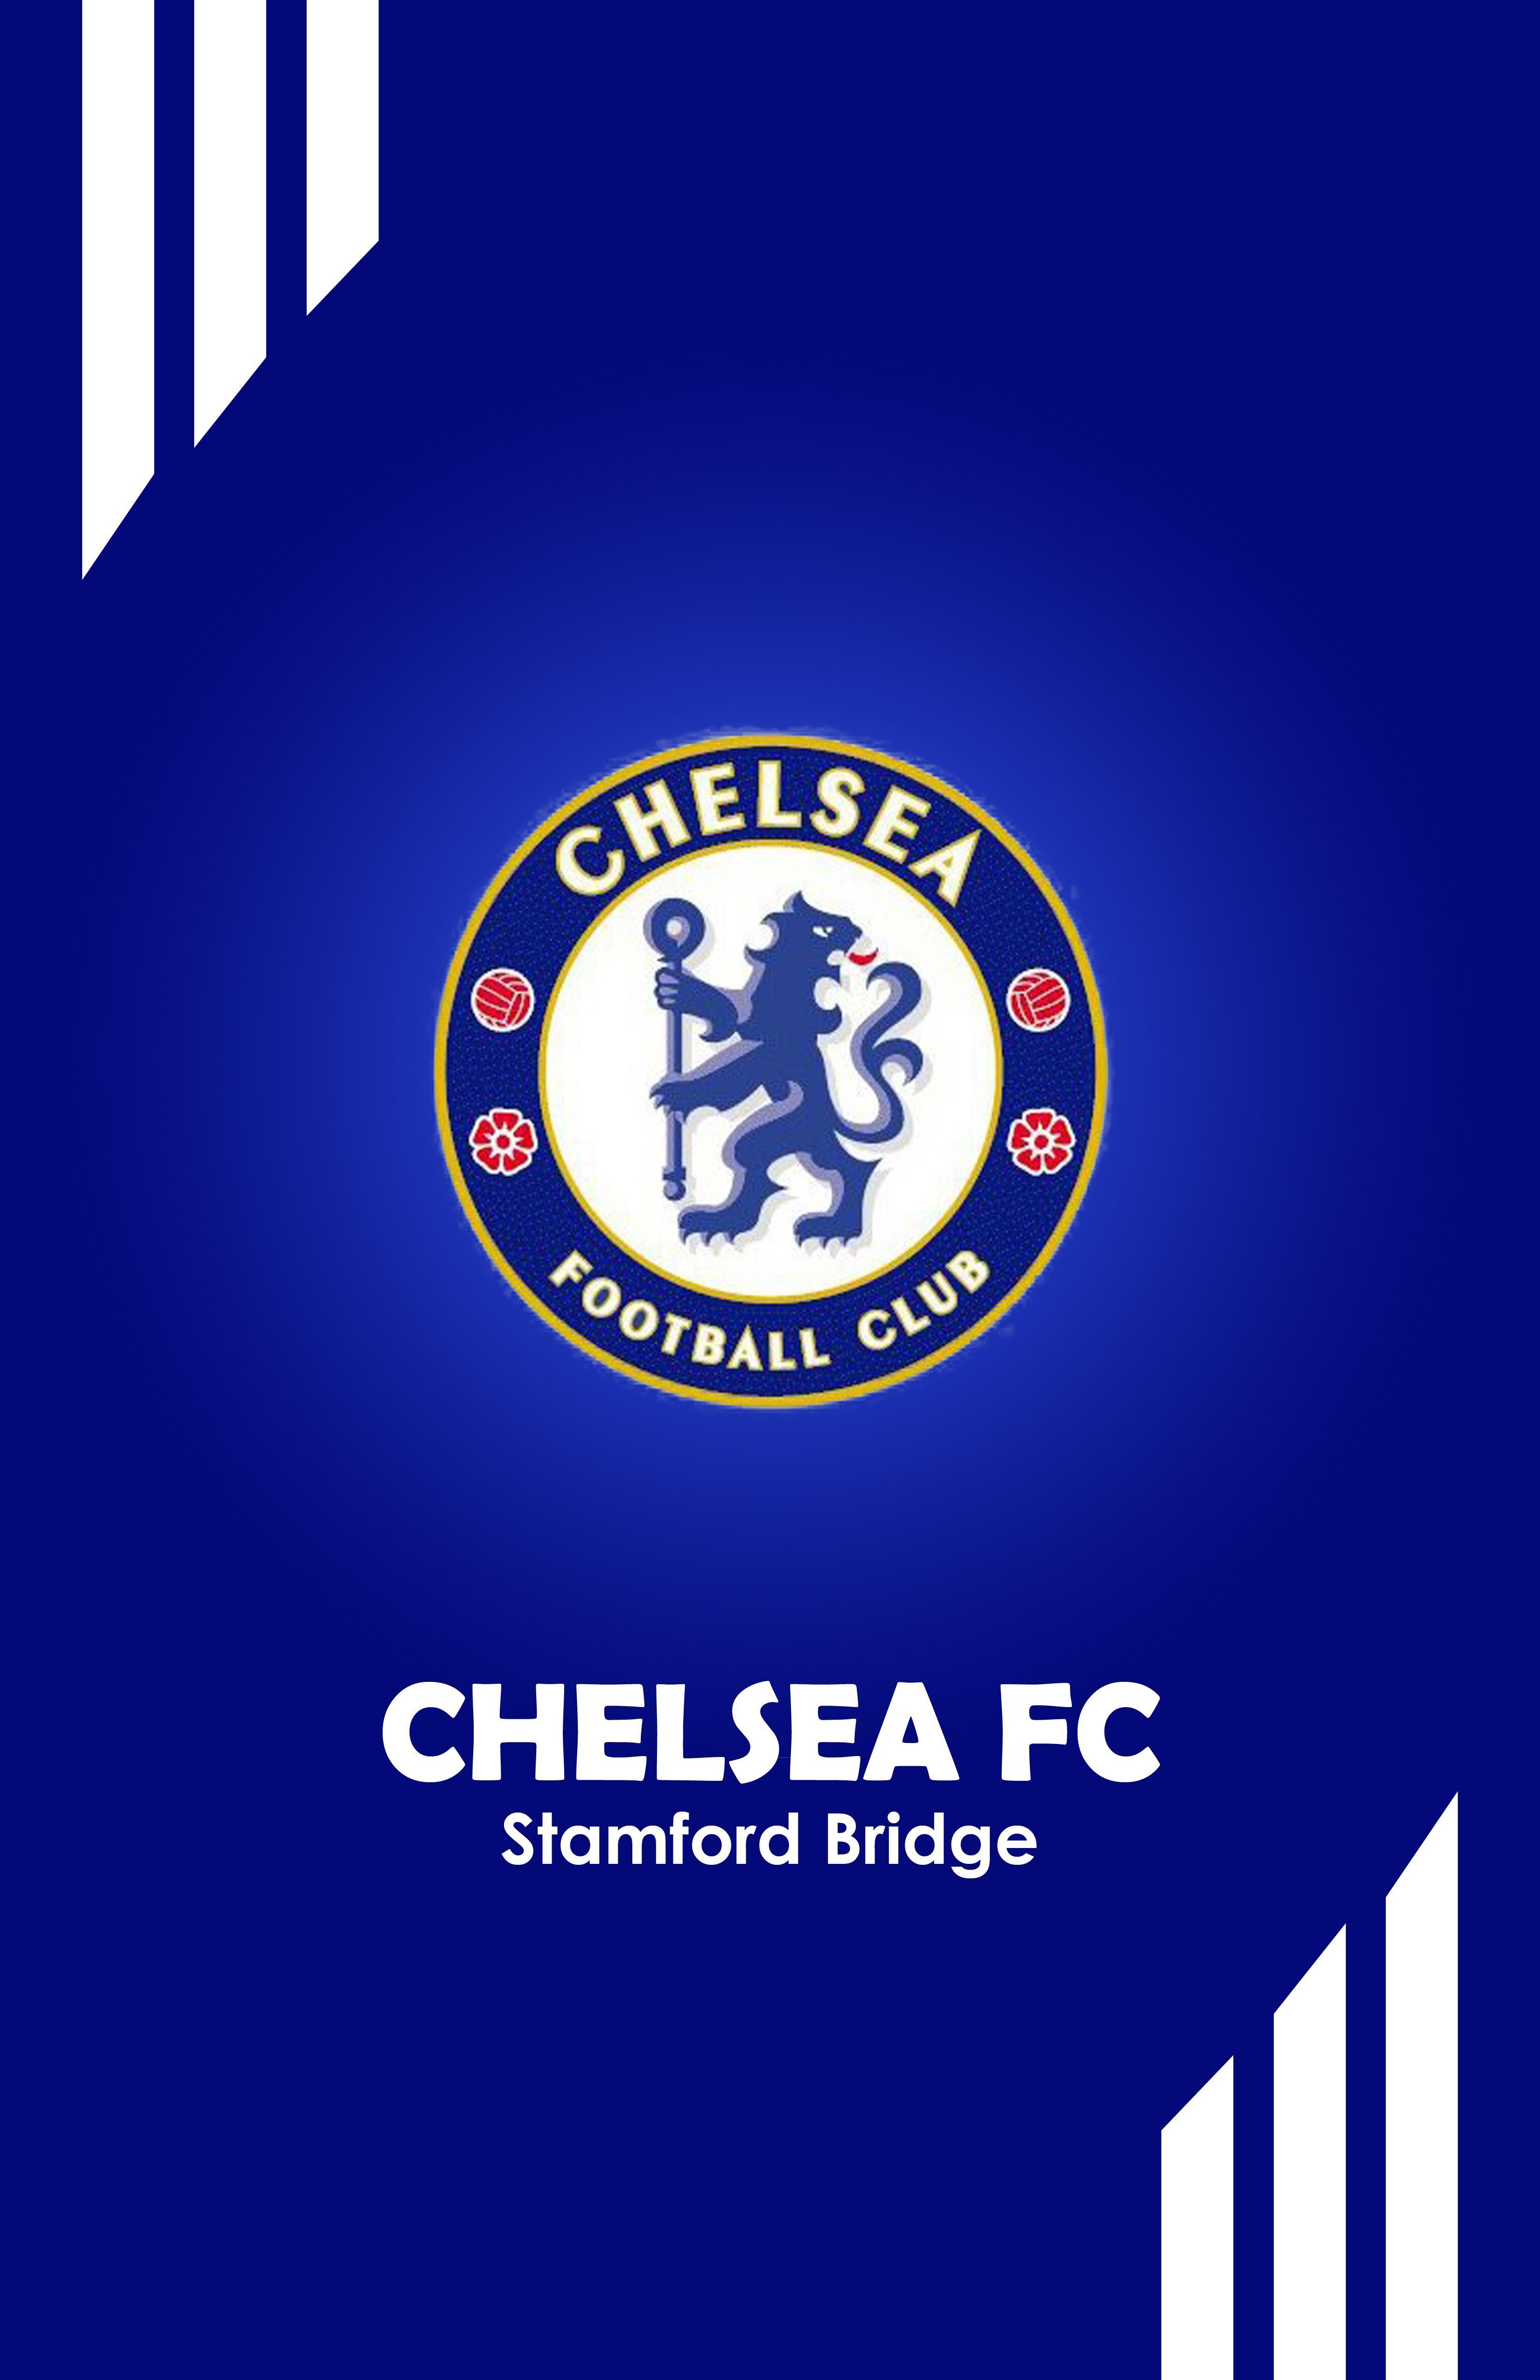 ChelseaFC Wallpaper chelsea Chelsea Sepak bola dan Olahraga 3300x5100